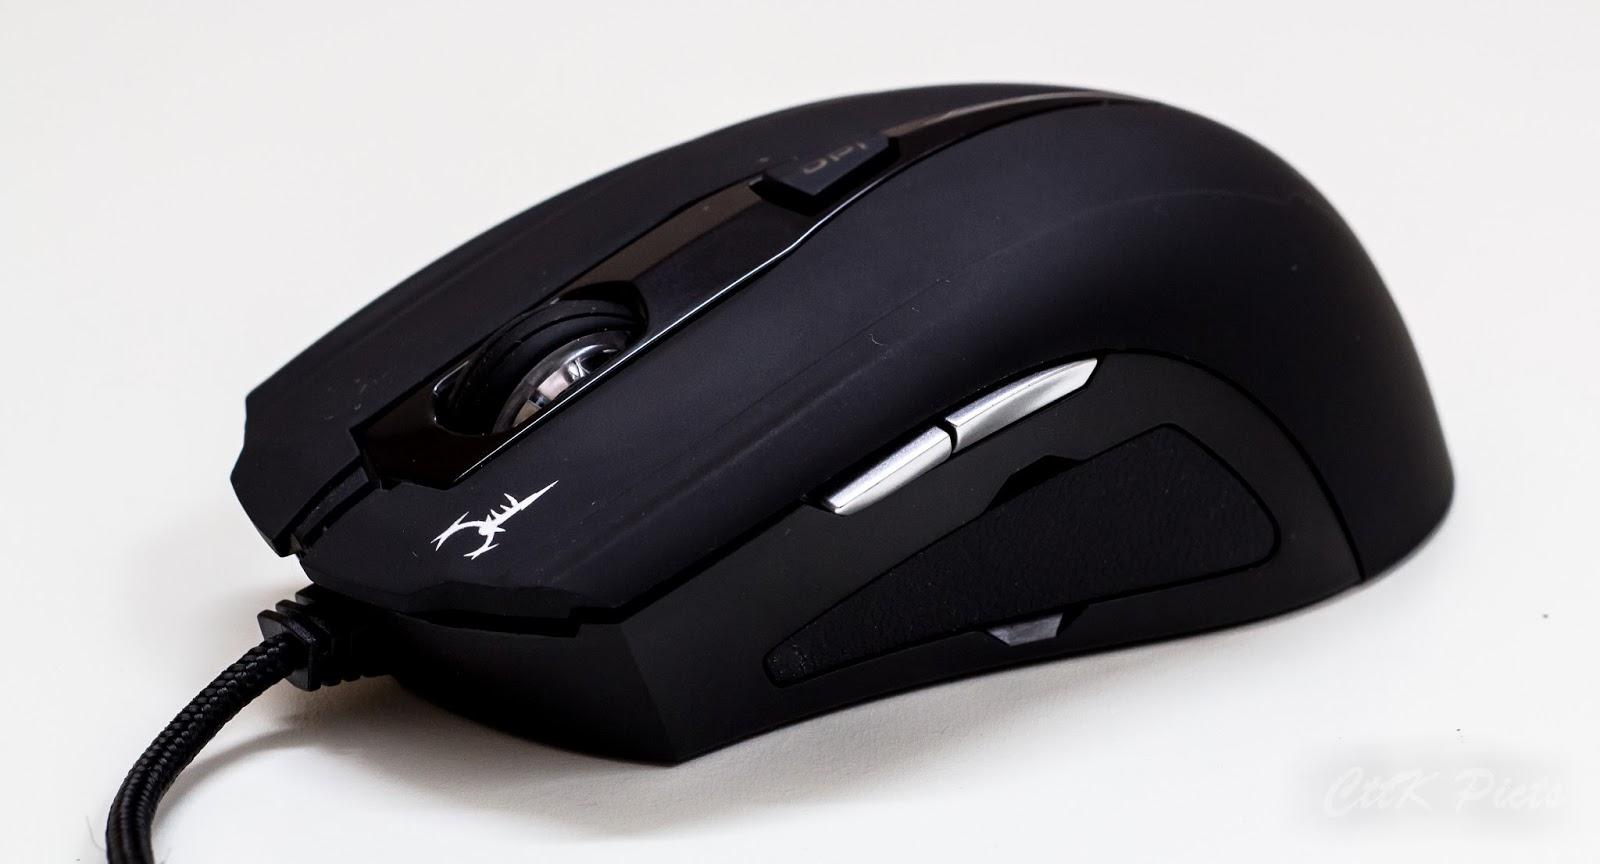 Gamdias Hades Extension Optical Gaming Mouse 64